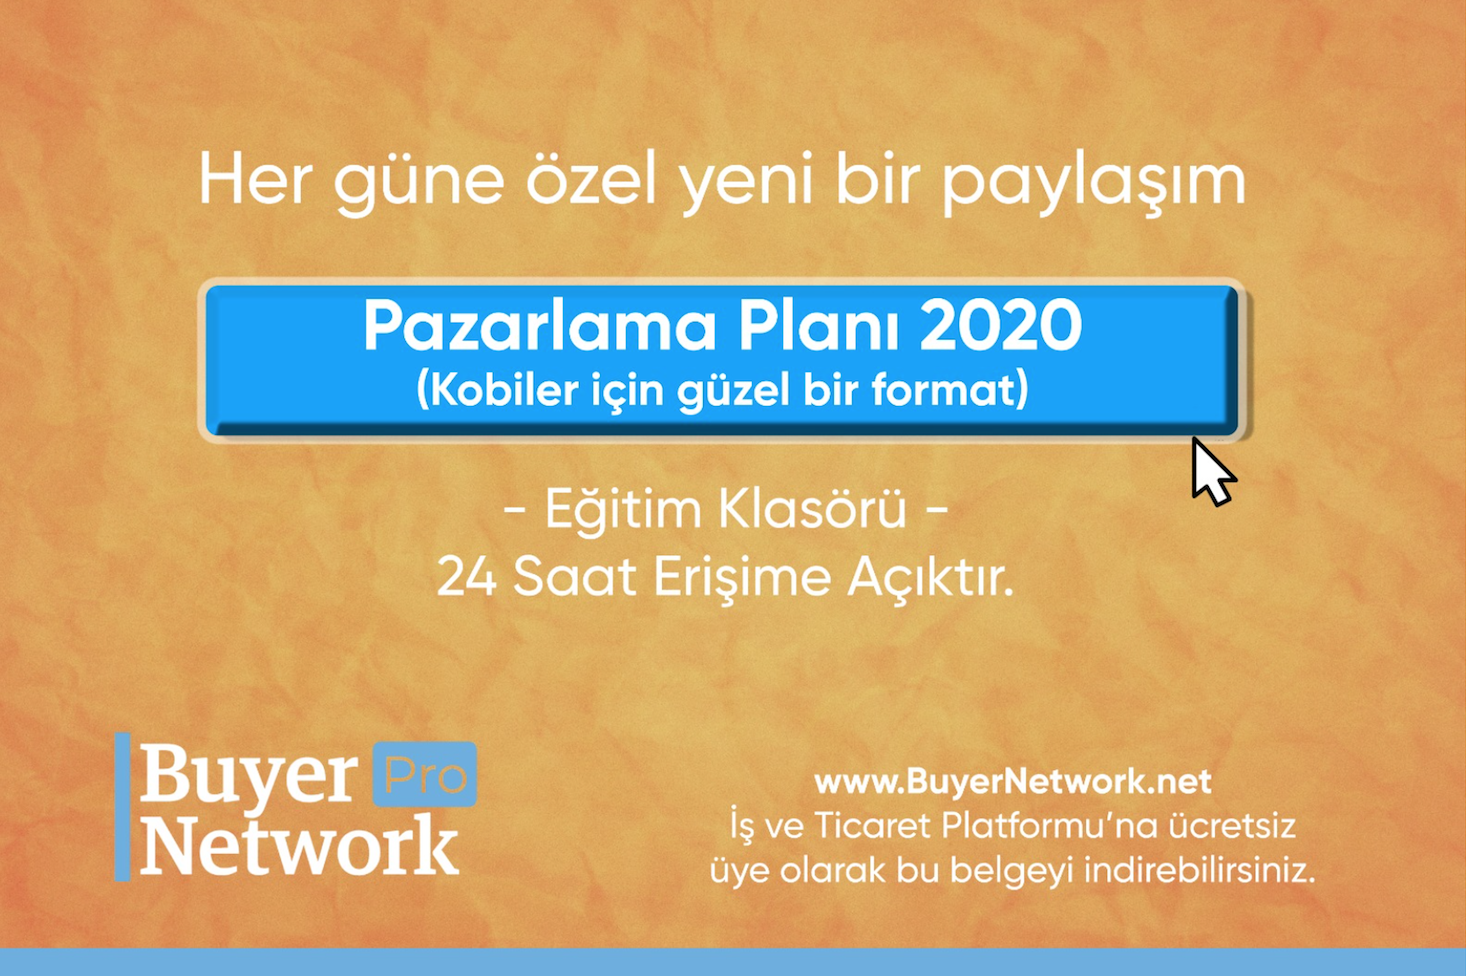 Serkan UYGUR Consulting Buyer Network www.serkanuygur.com.tr